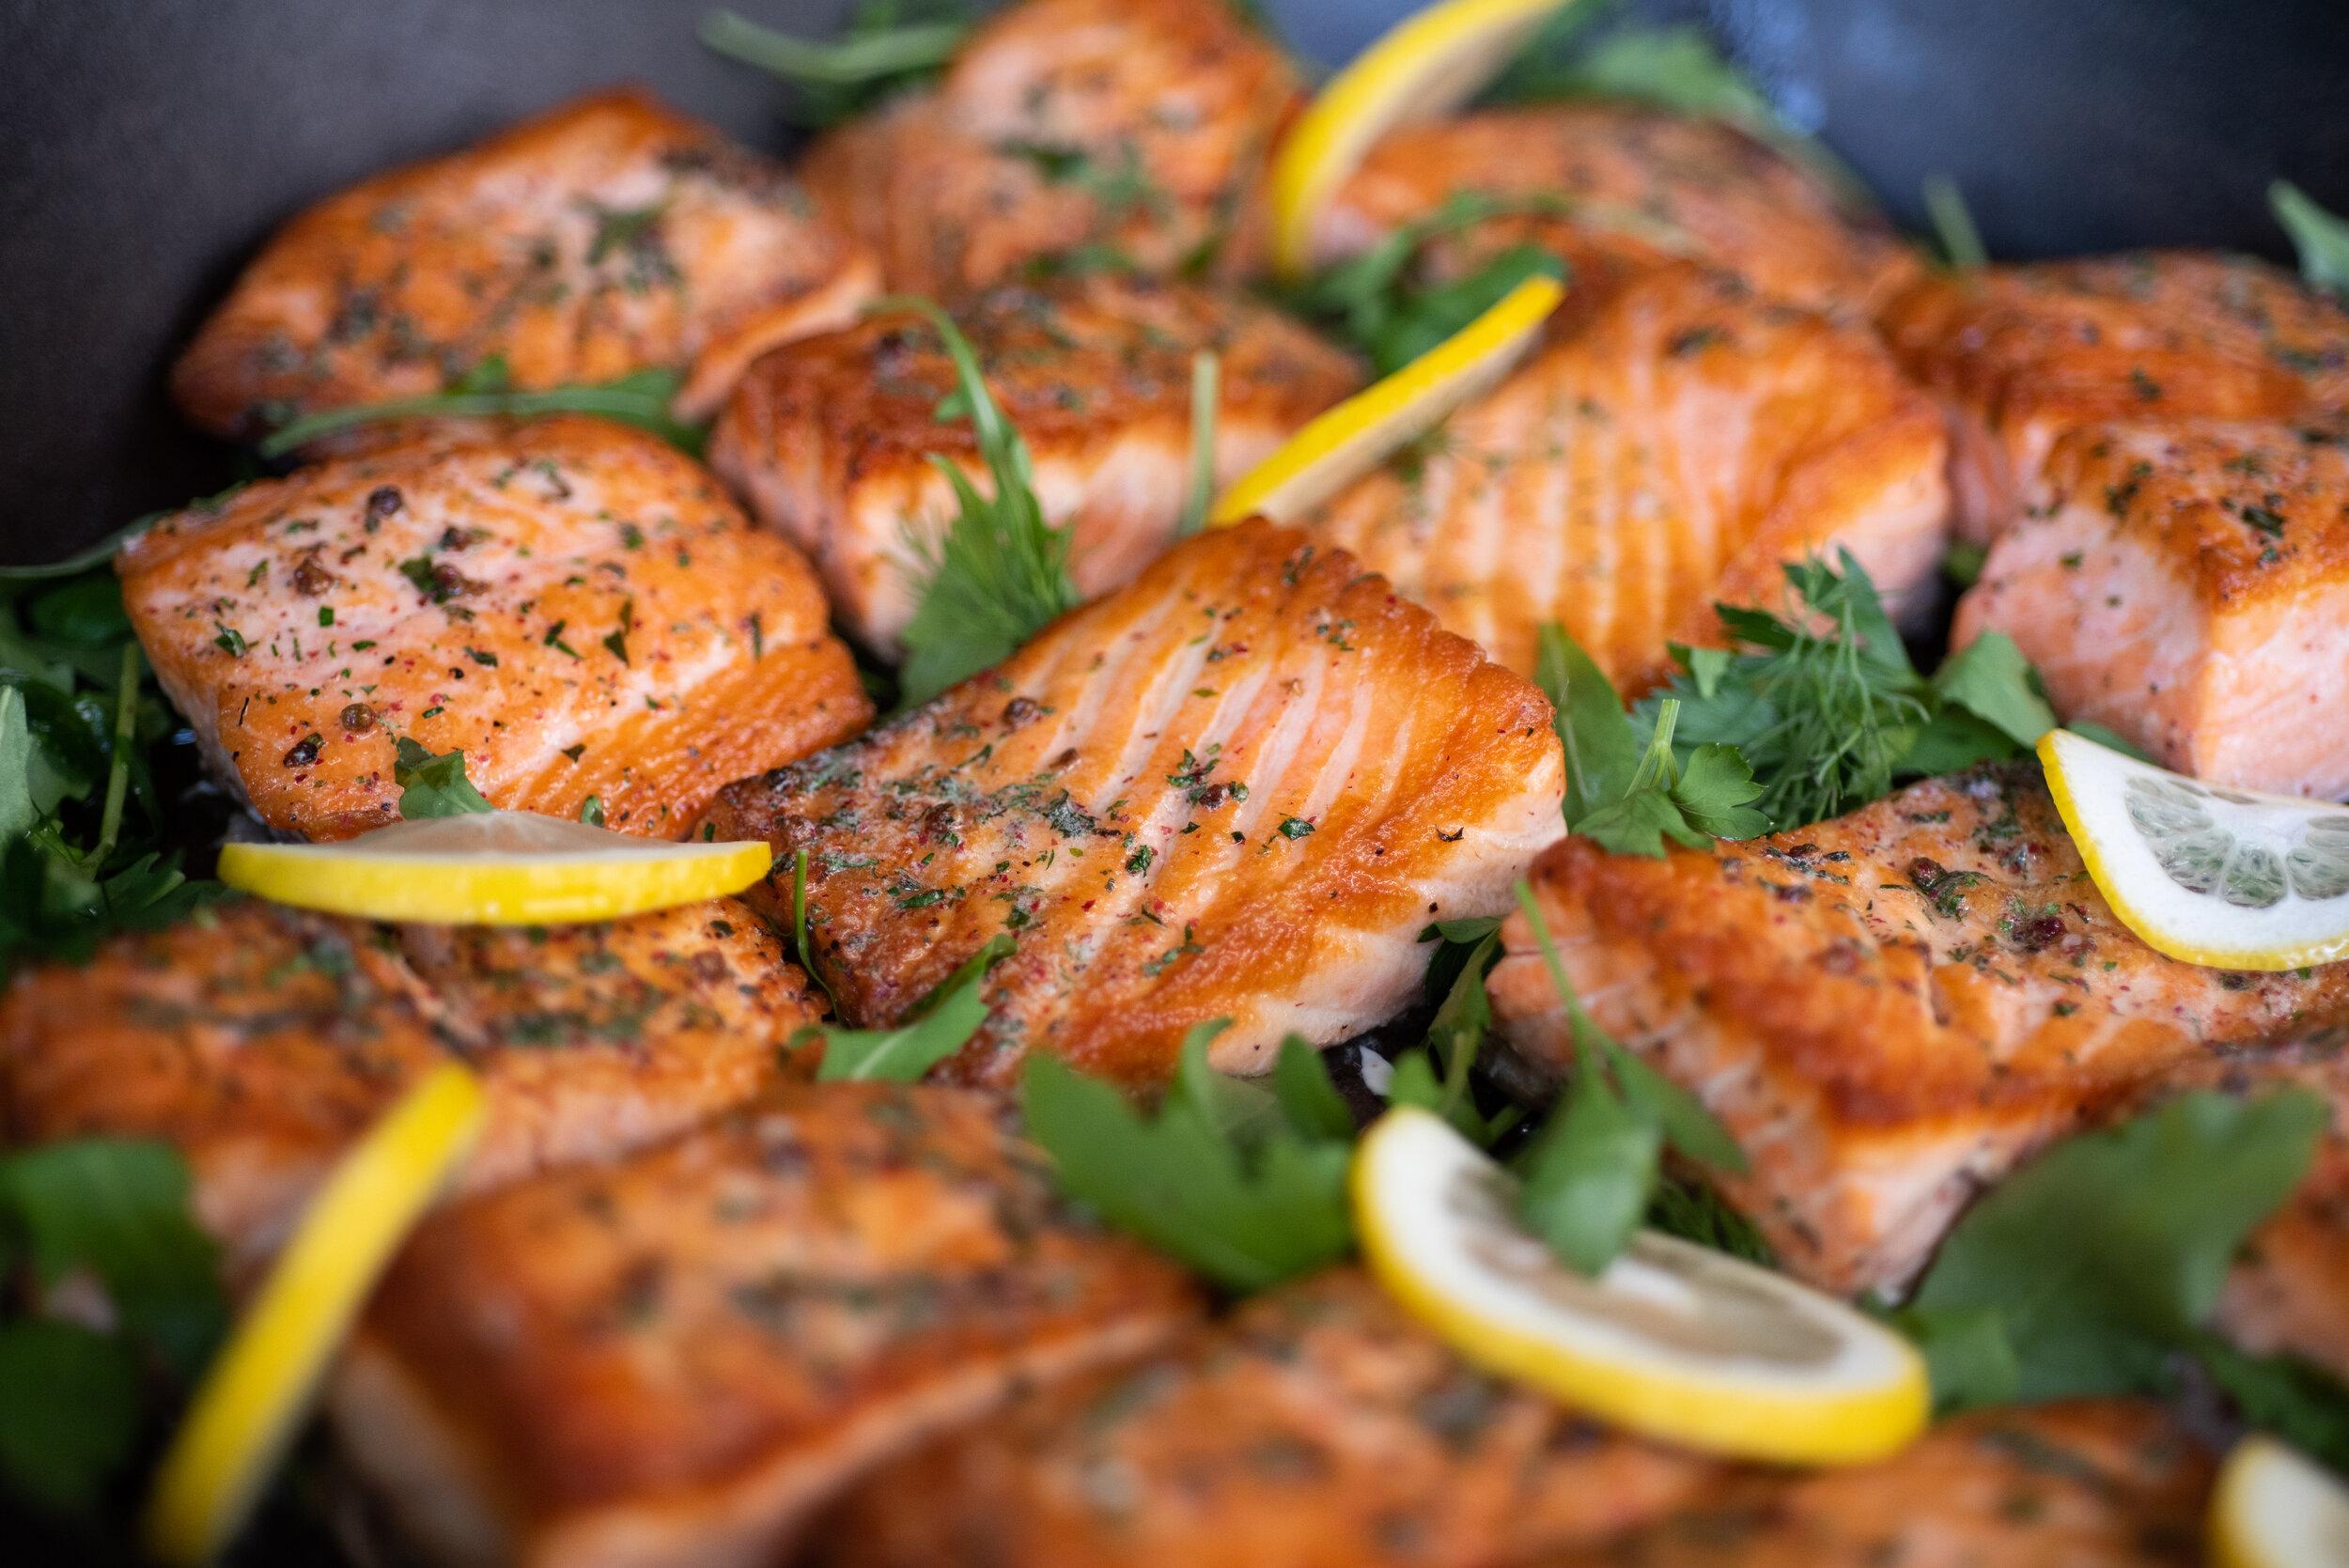 Buffet - Salmon.jpg